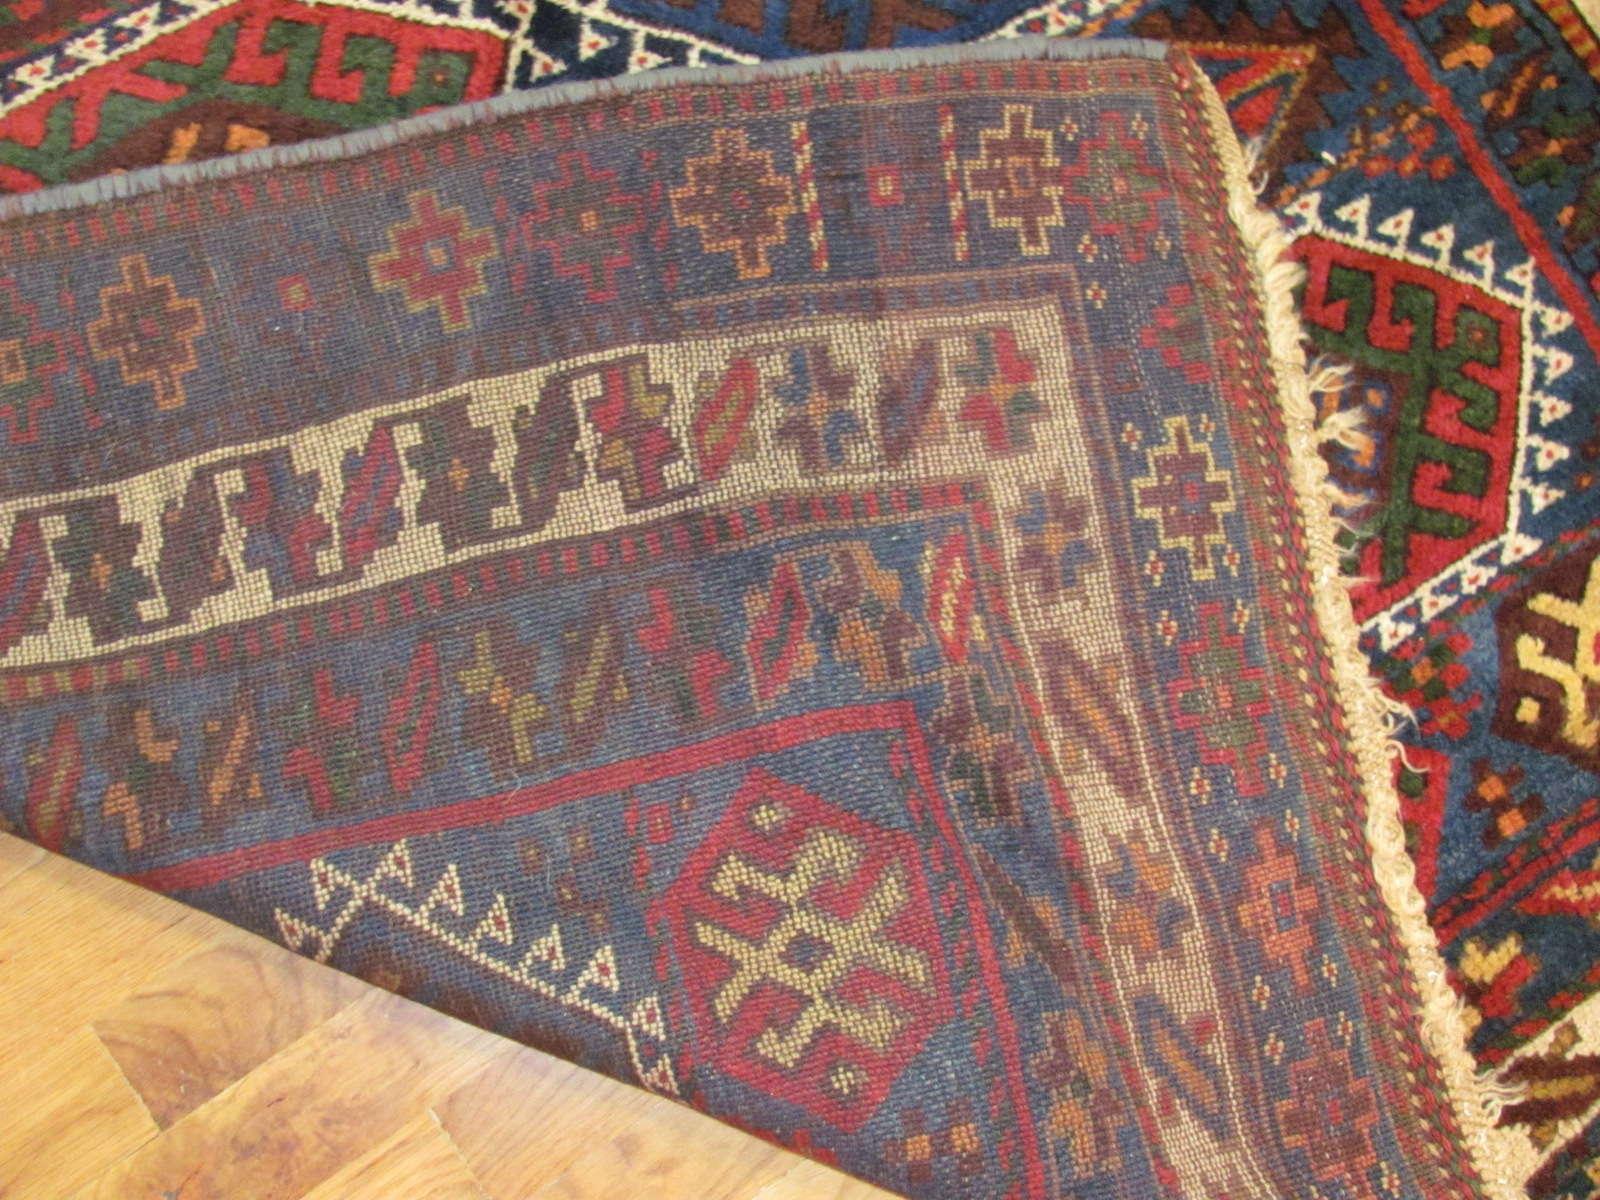 24554 antique persian joffee kurd rug 4,9x7,9 -3